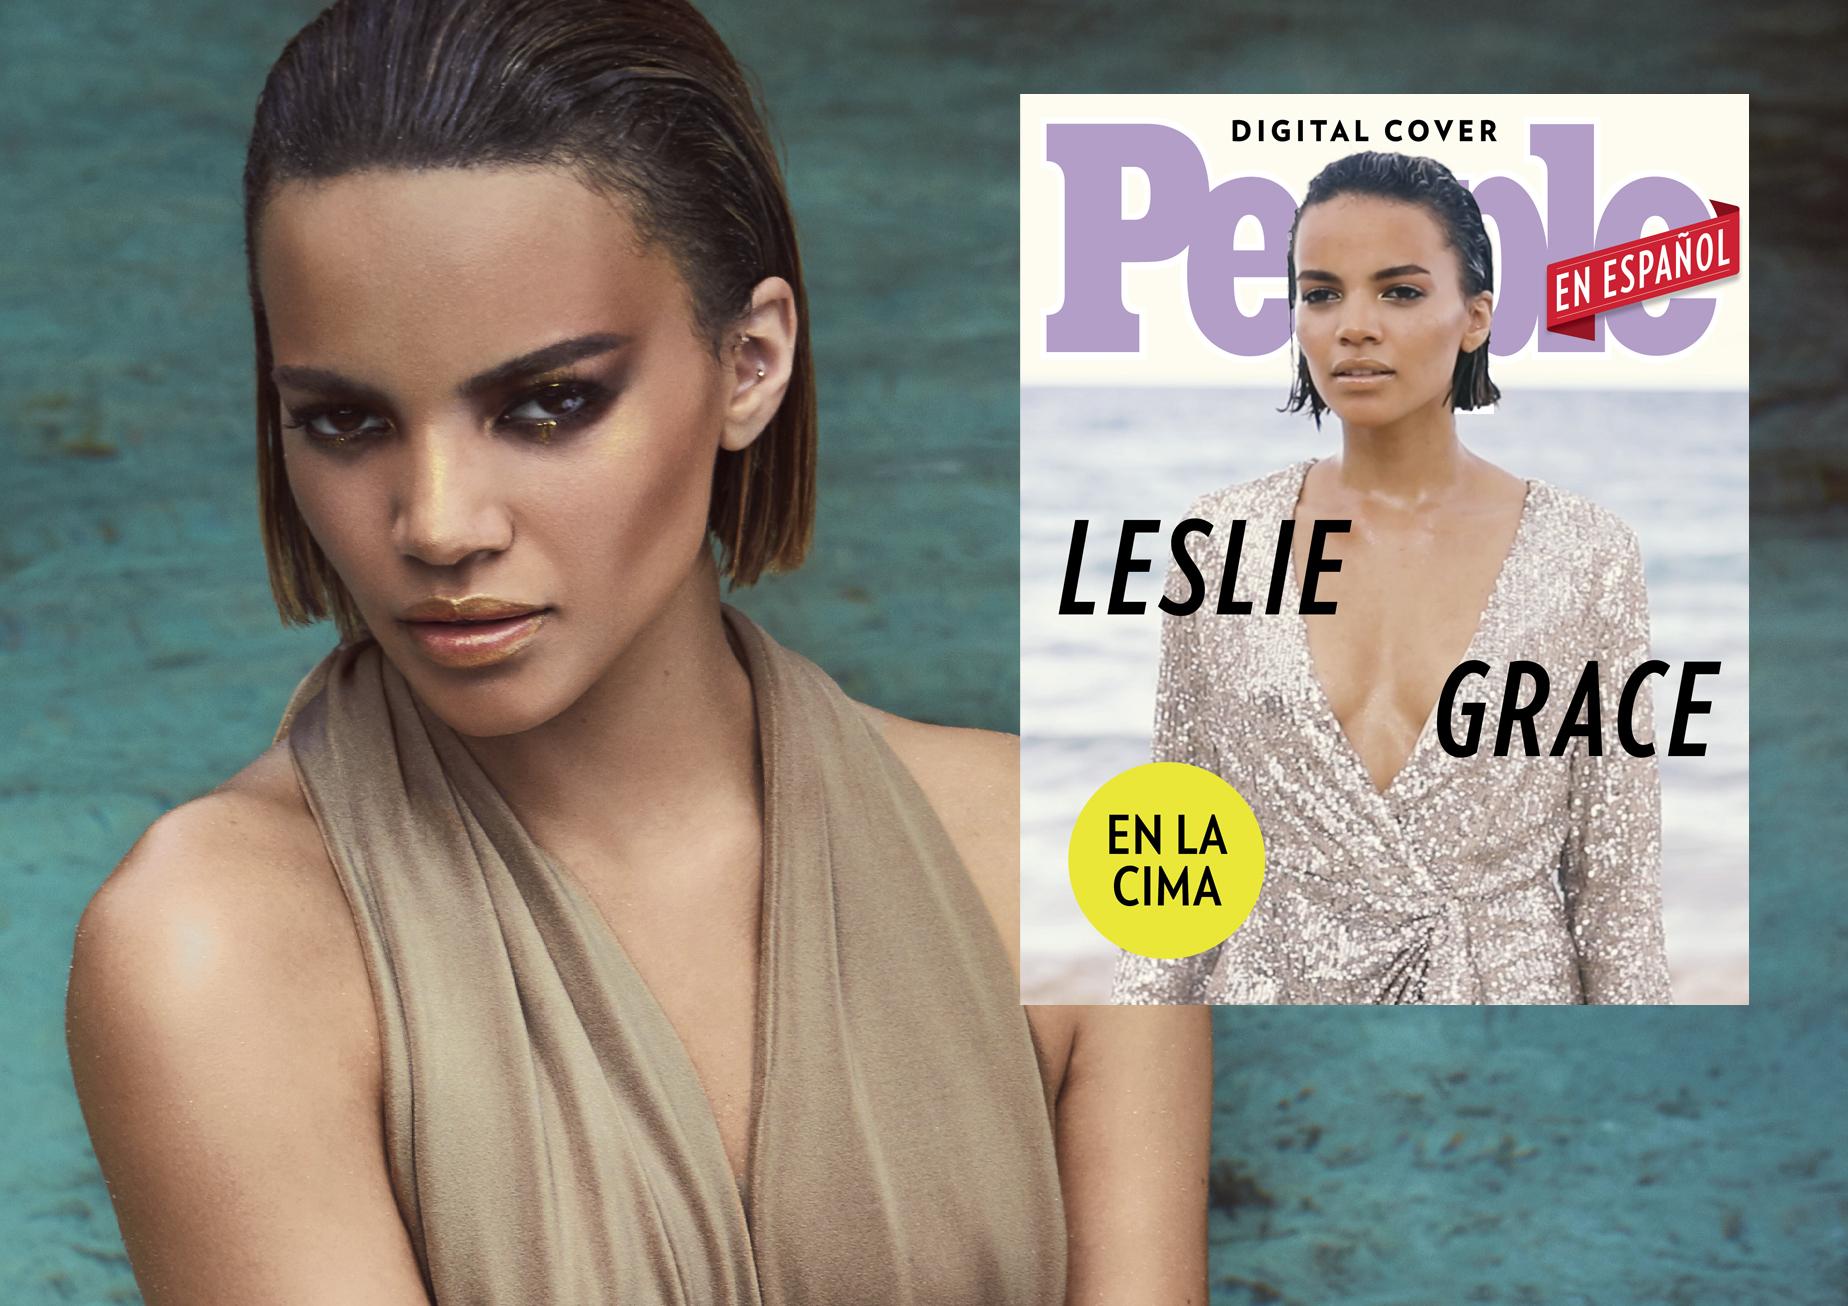 Leslie Grace - Digital Cover - DO NOT REUSE